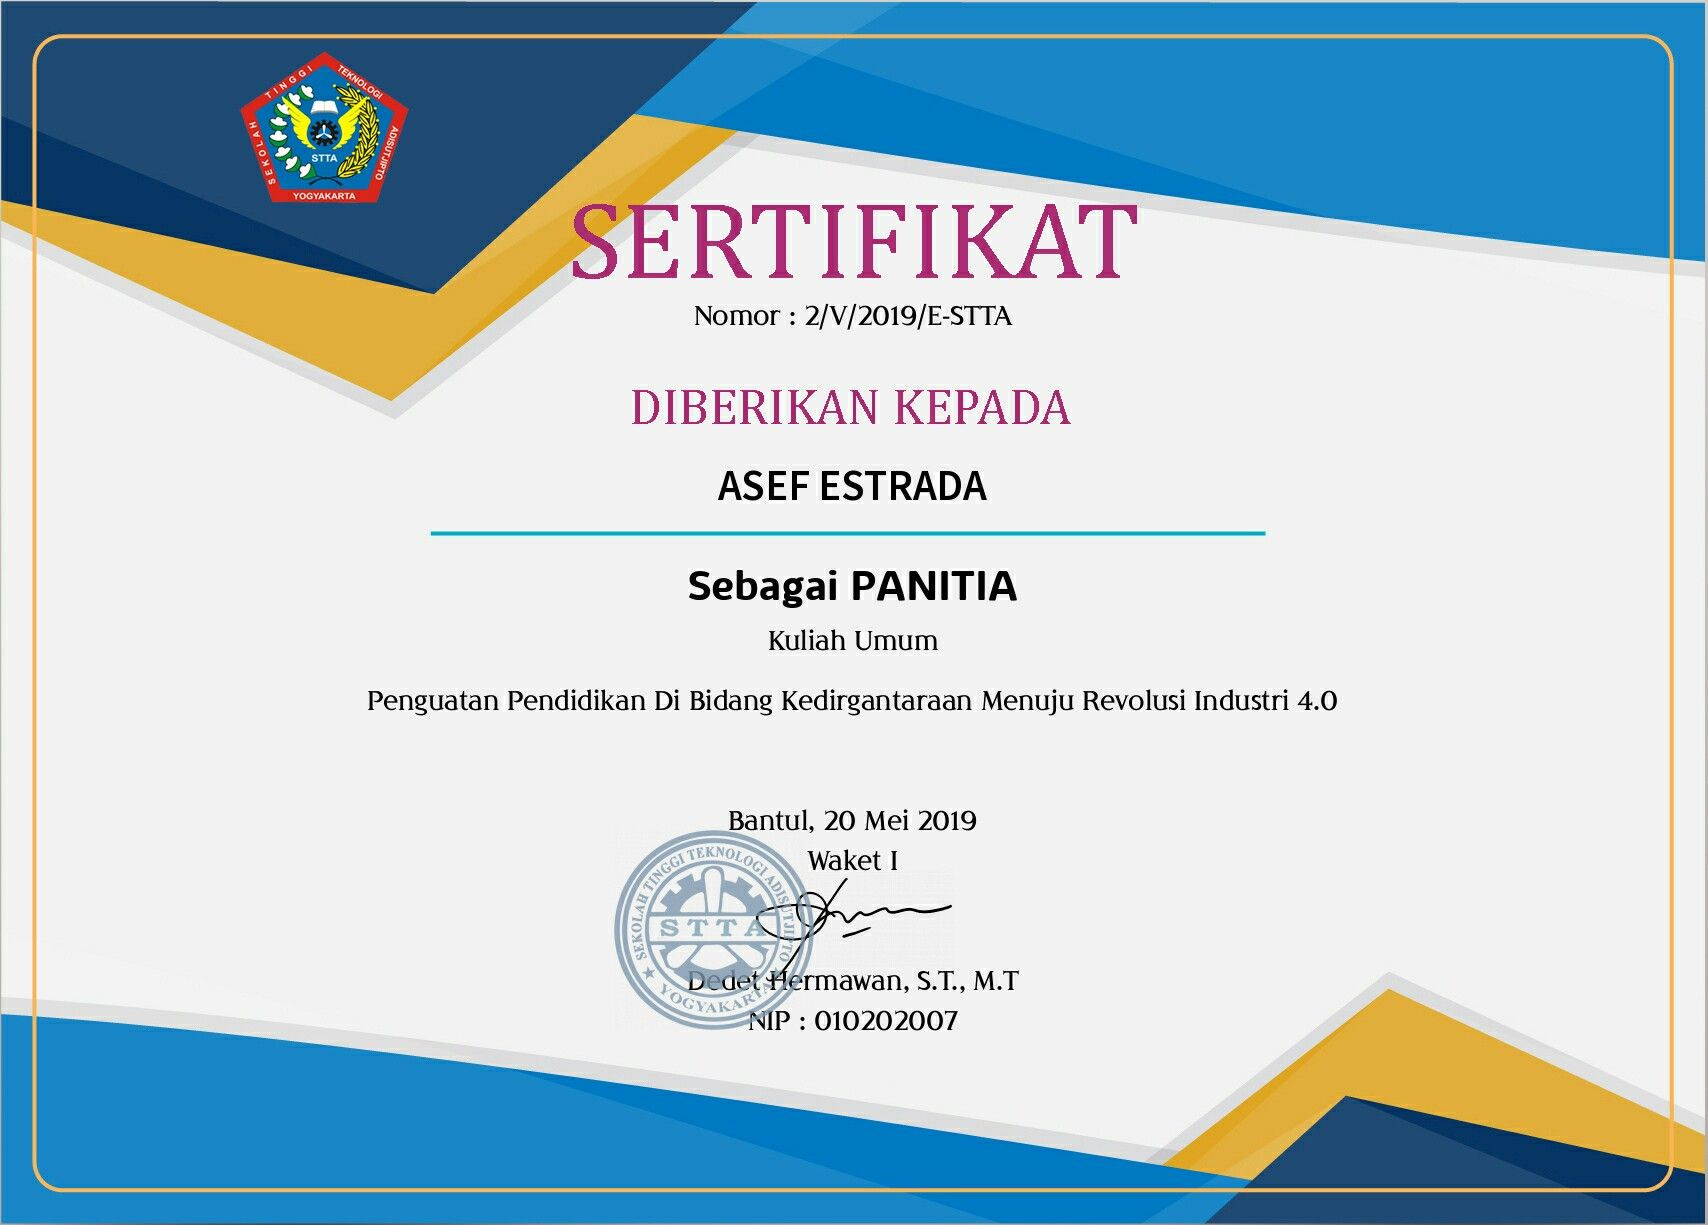 Ini adalah contoh sertifikat seminar ataupun kuliah umum